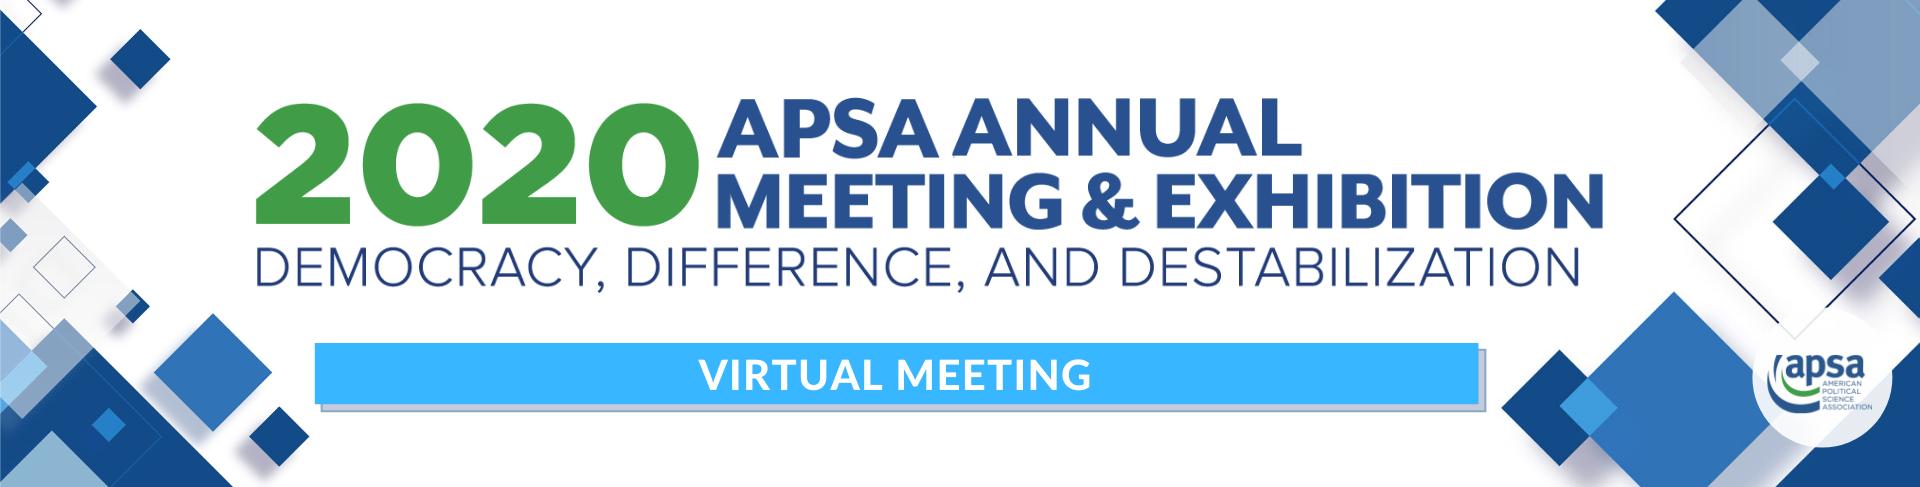 2020 APSA Annual Meeting